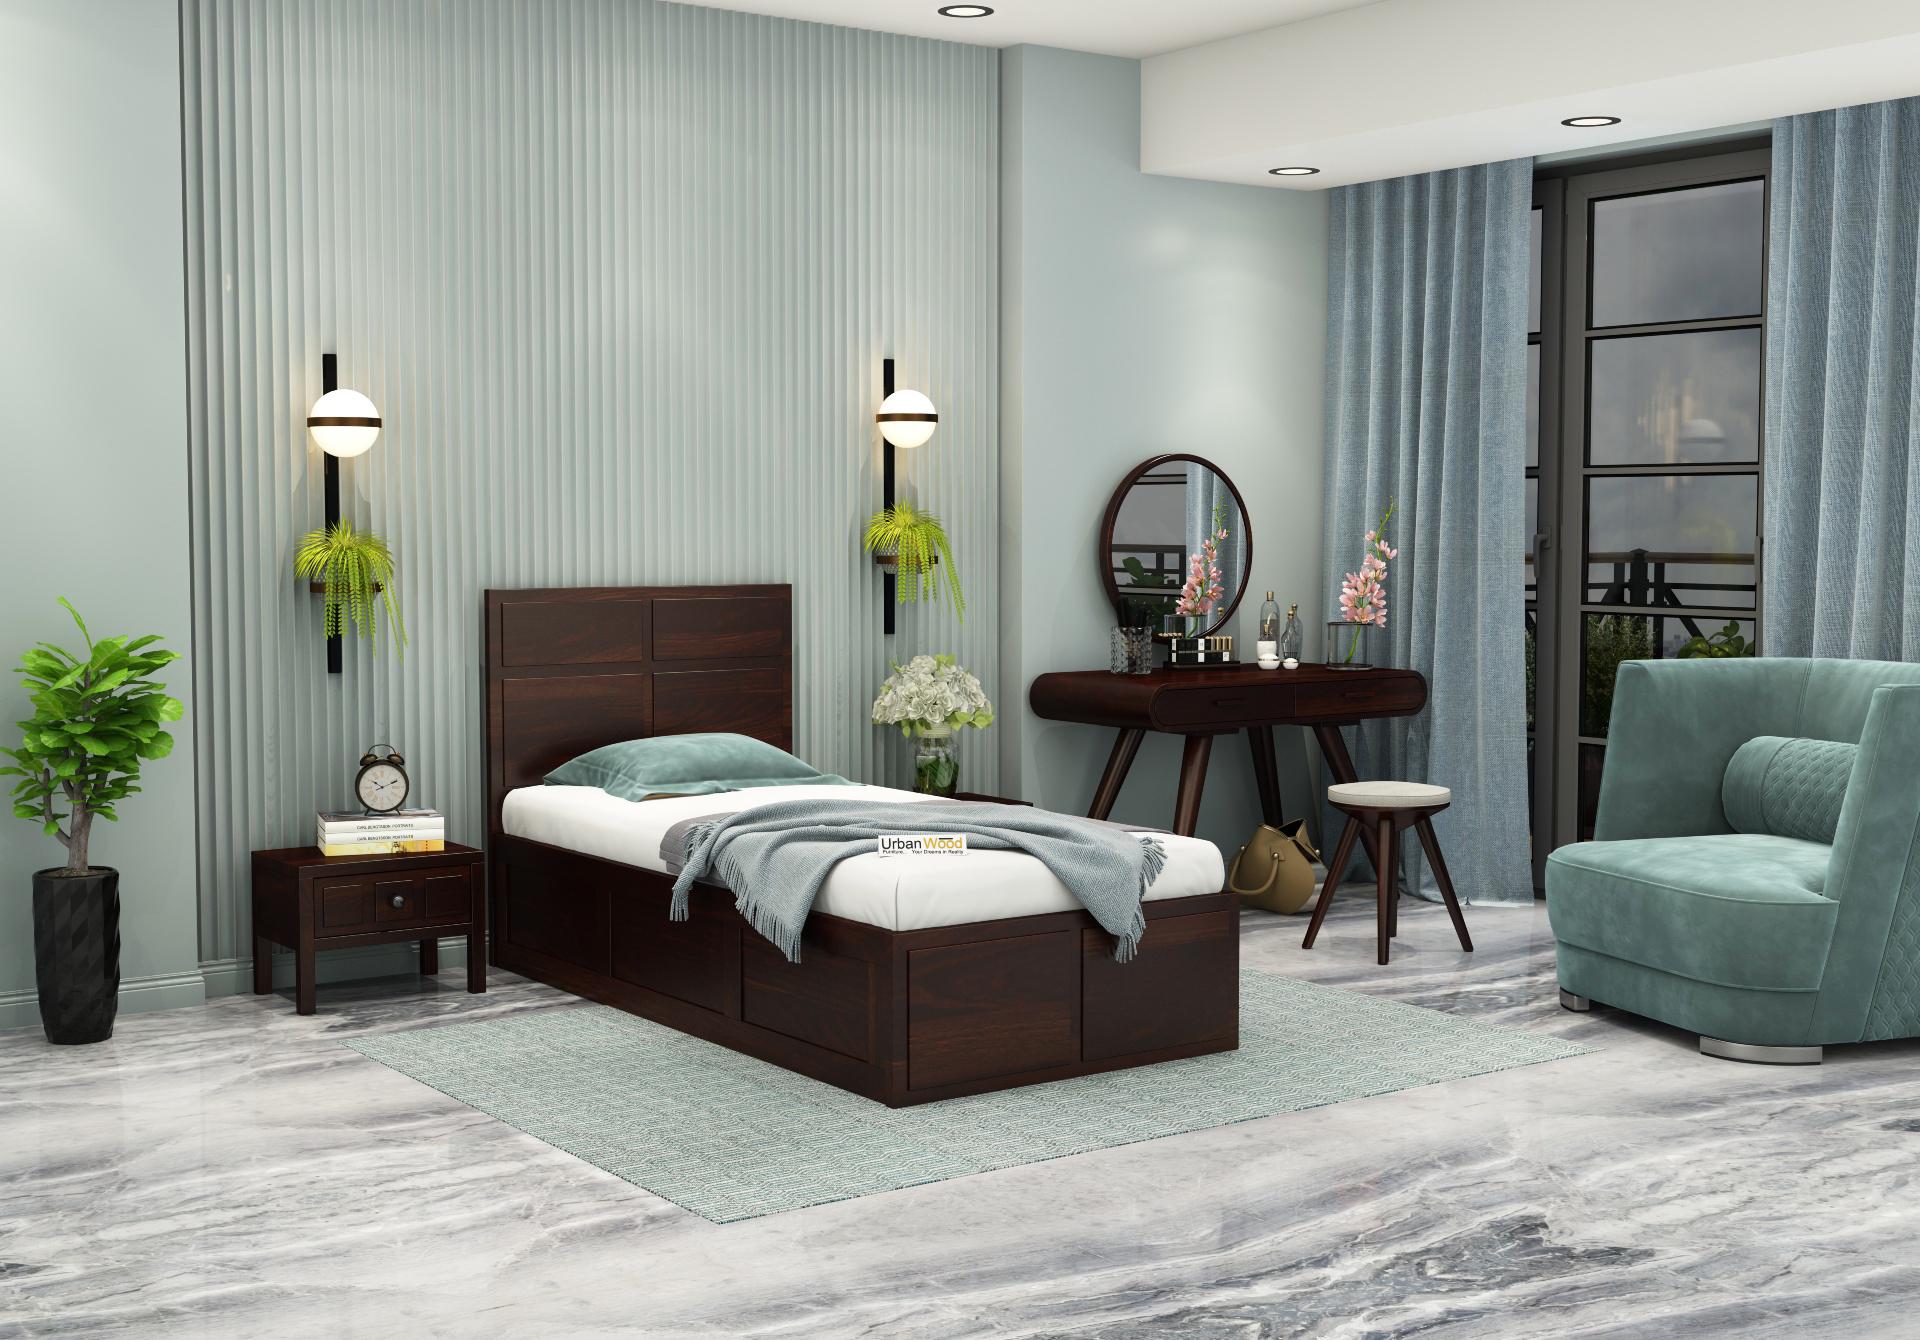 Bedswind Single Bed With Storage <small>( Walnut Finish )</small>